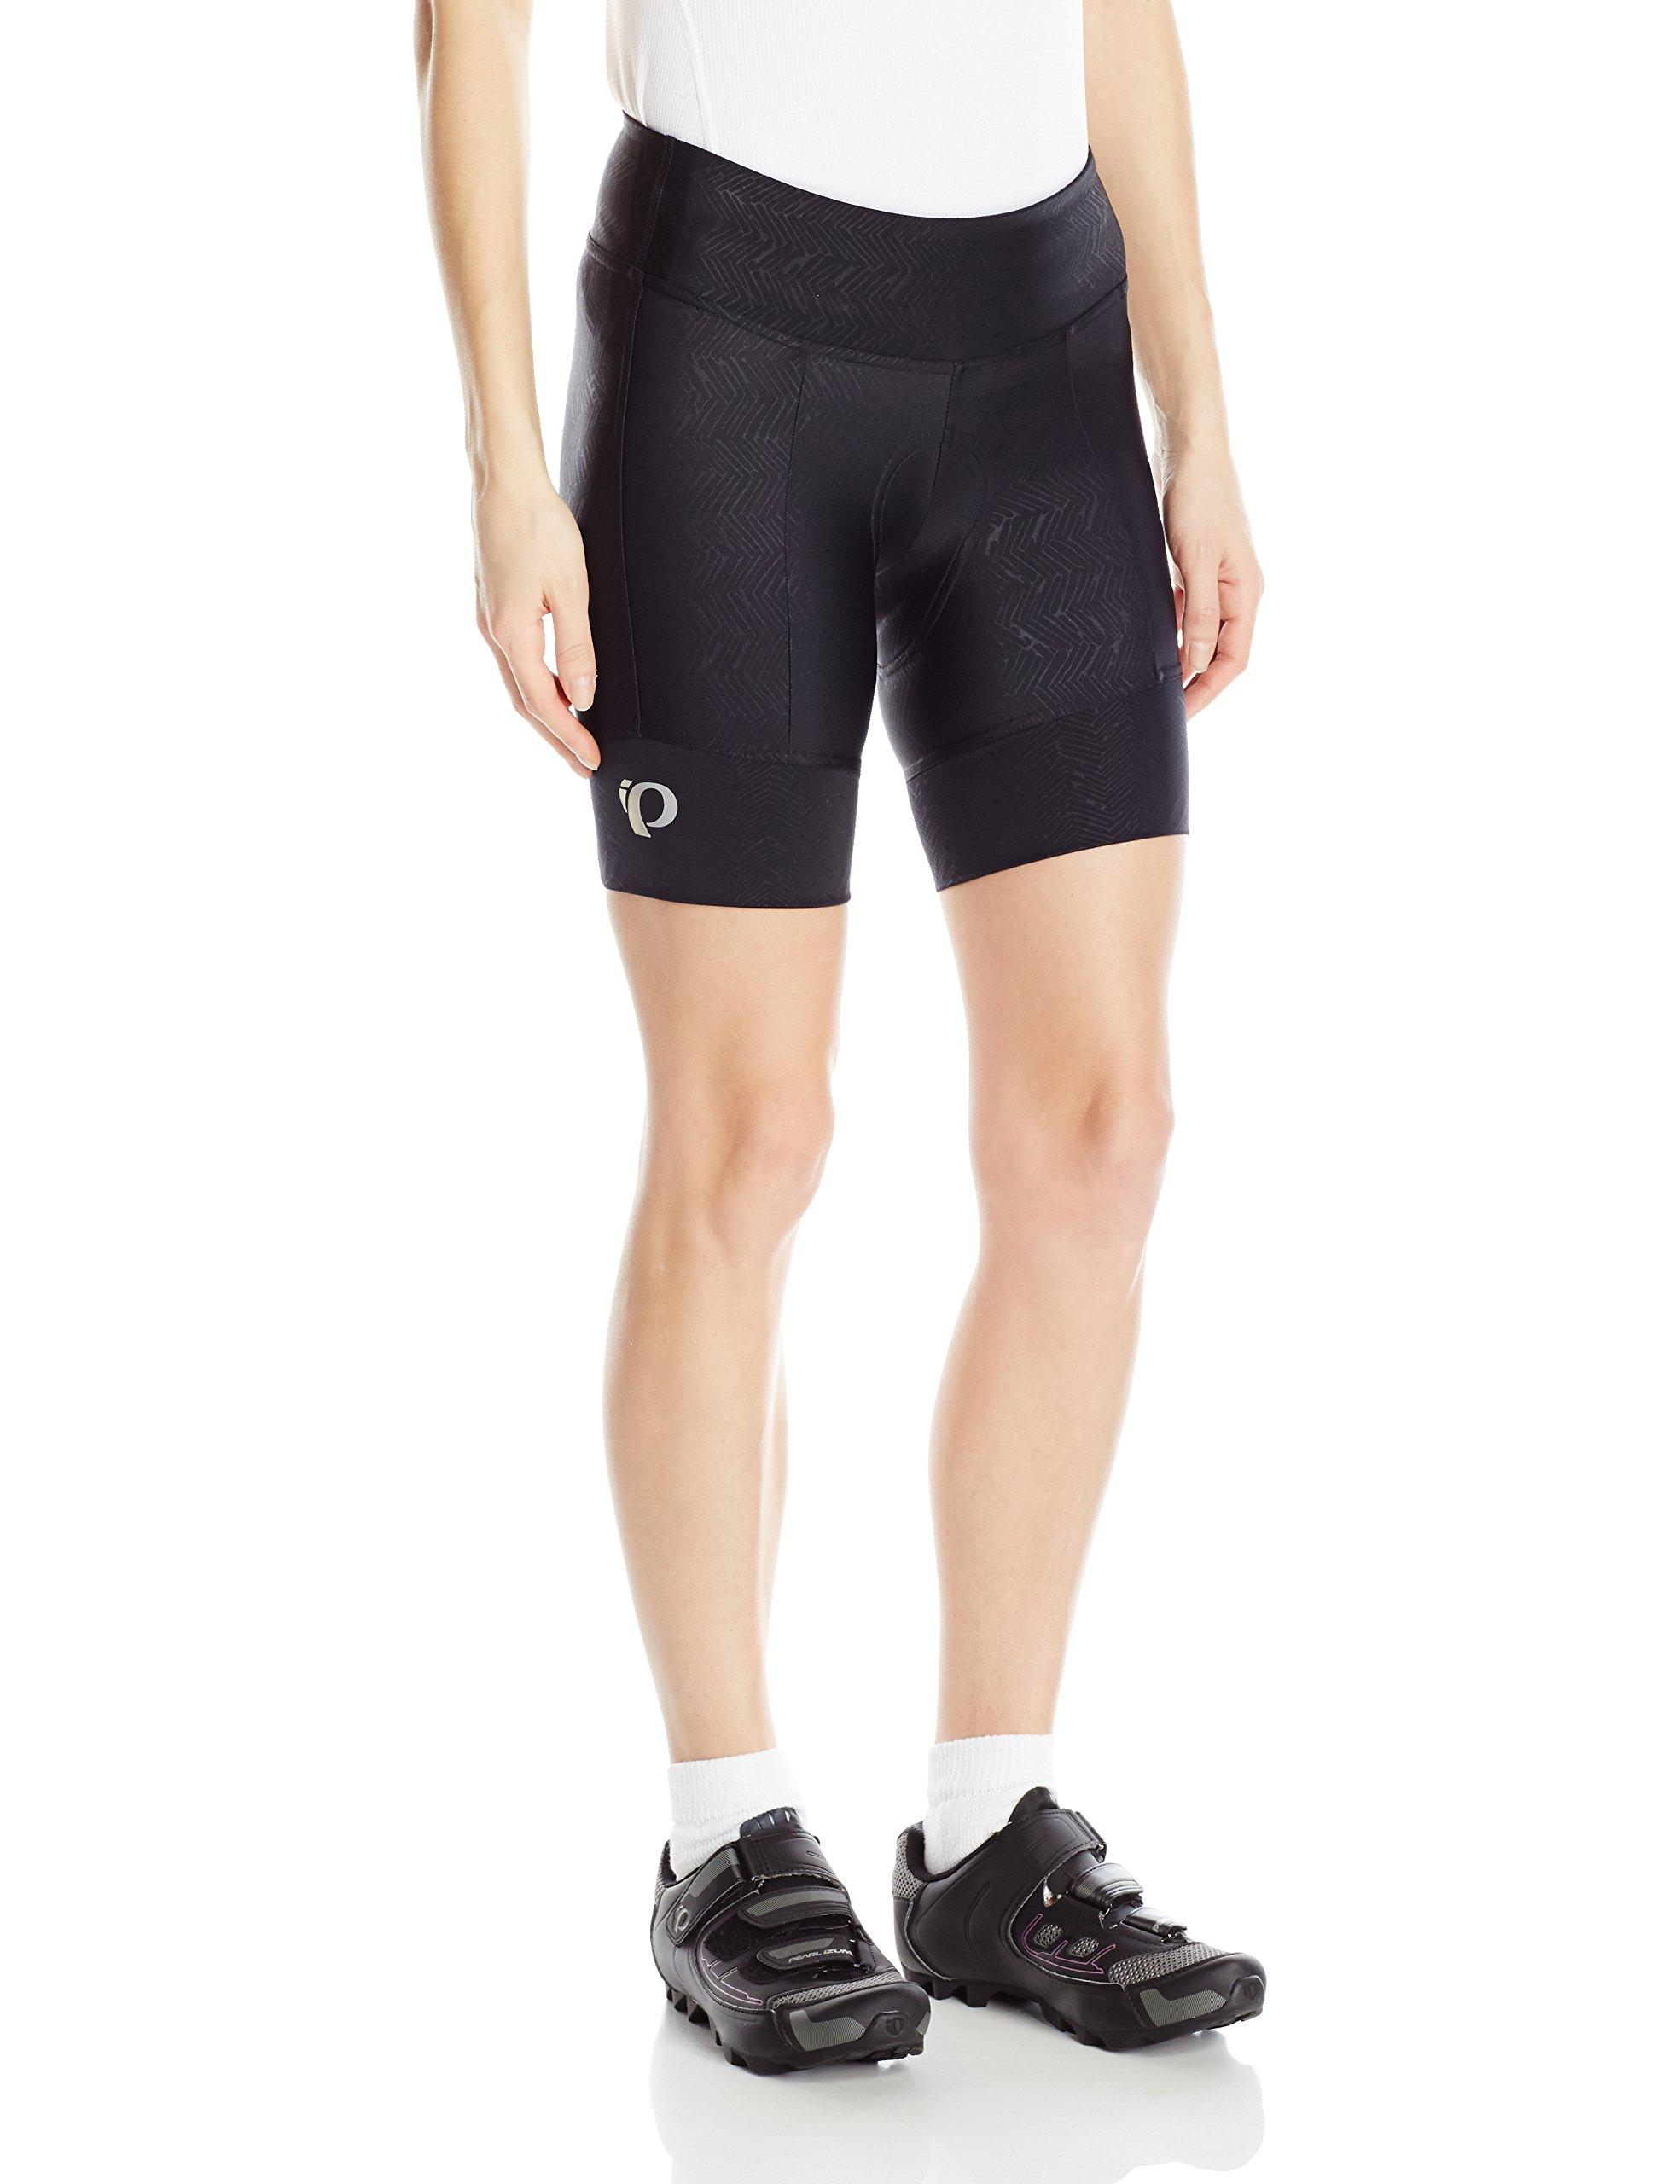 Pearl iZUMi Women's Pursuit Attack Shorts, Black Texture, X-Small